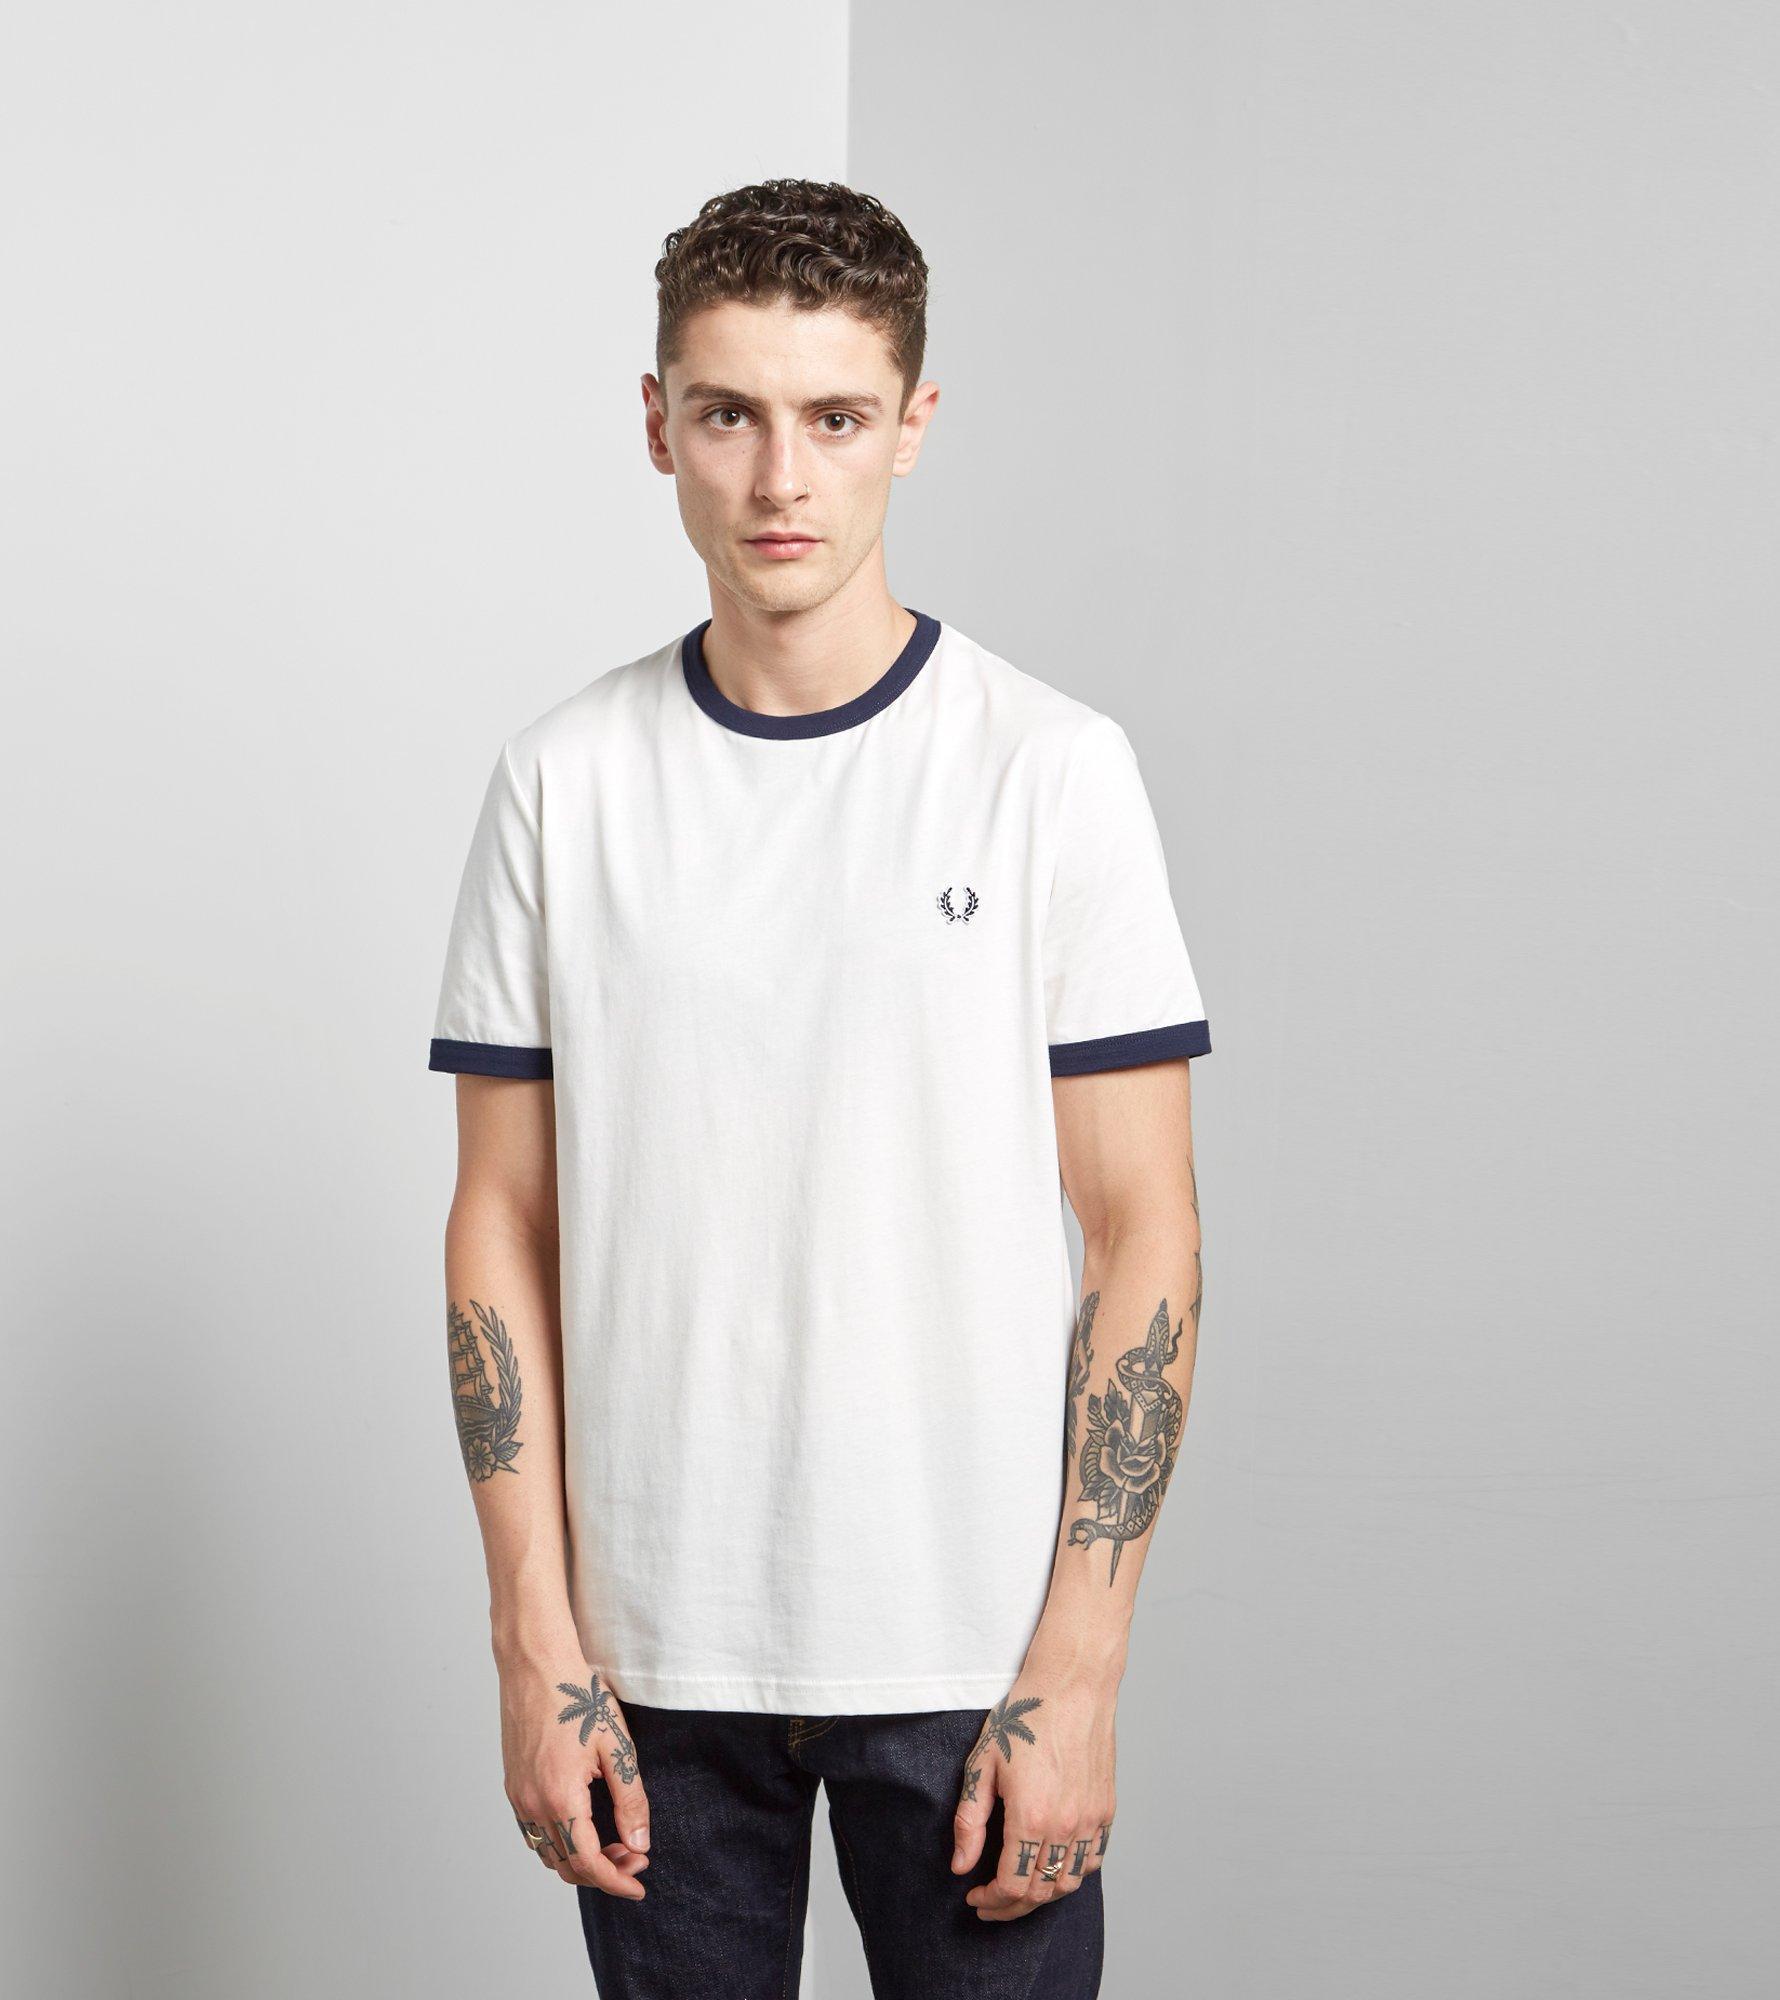 debenhams fred perry t shirt, OFF 70%,Free Shipping,